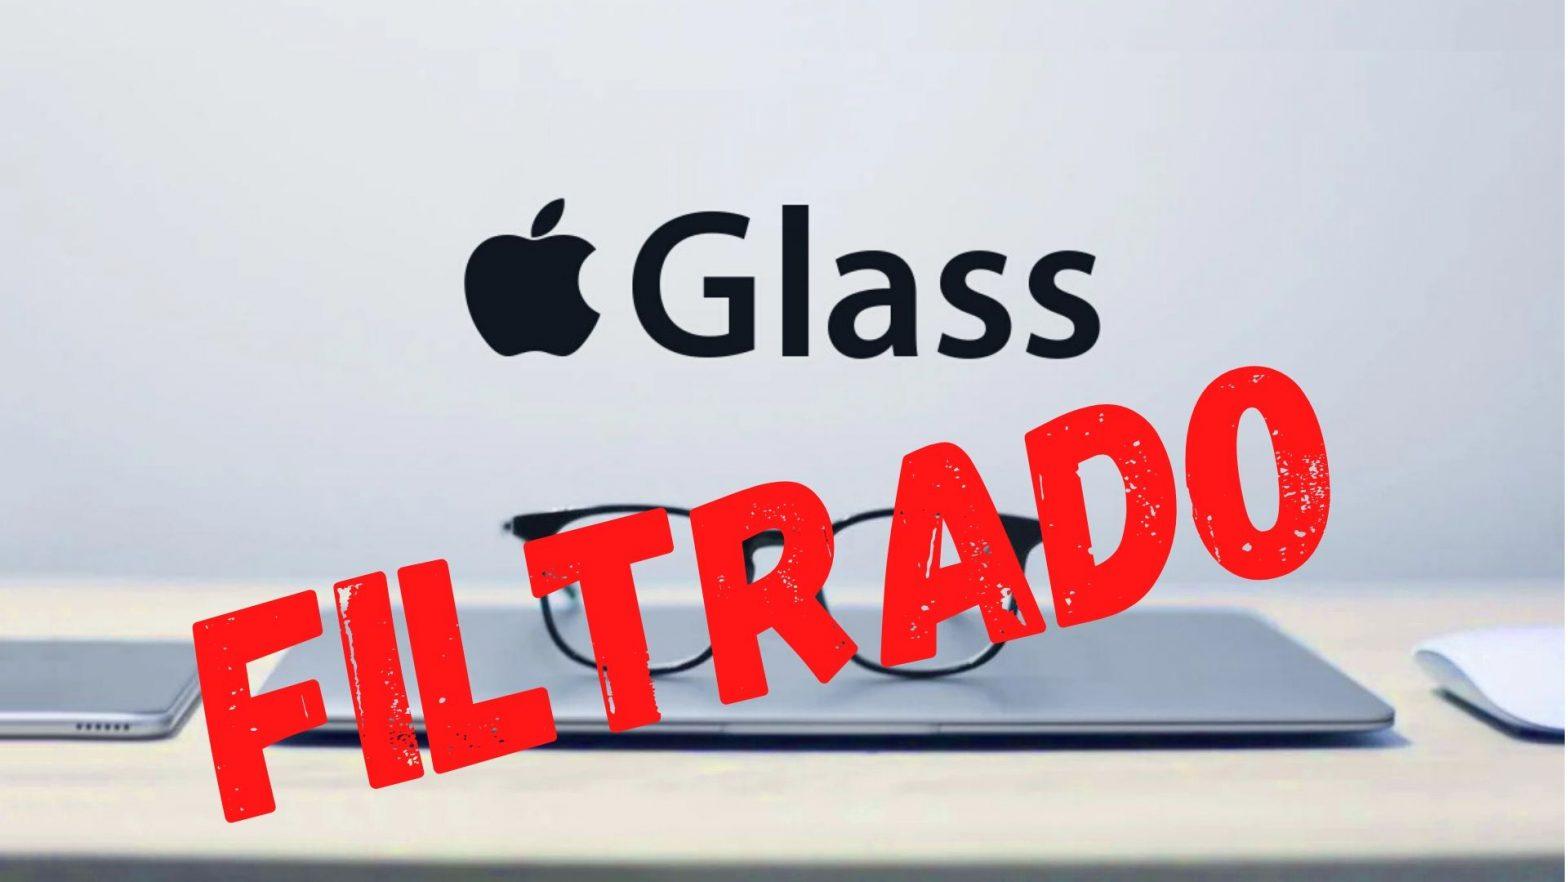 apple glass filtrado